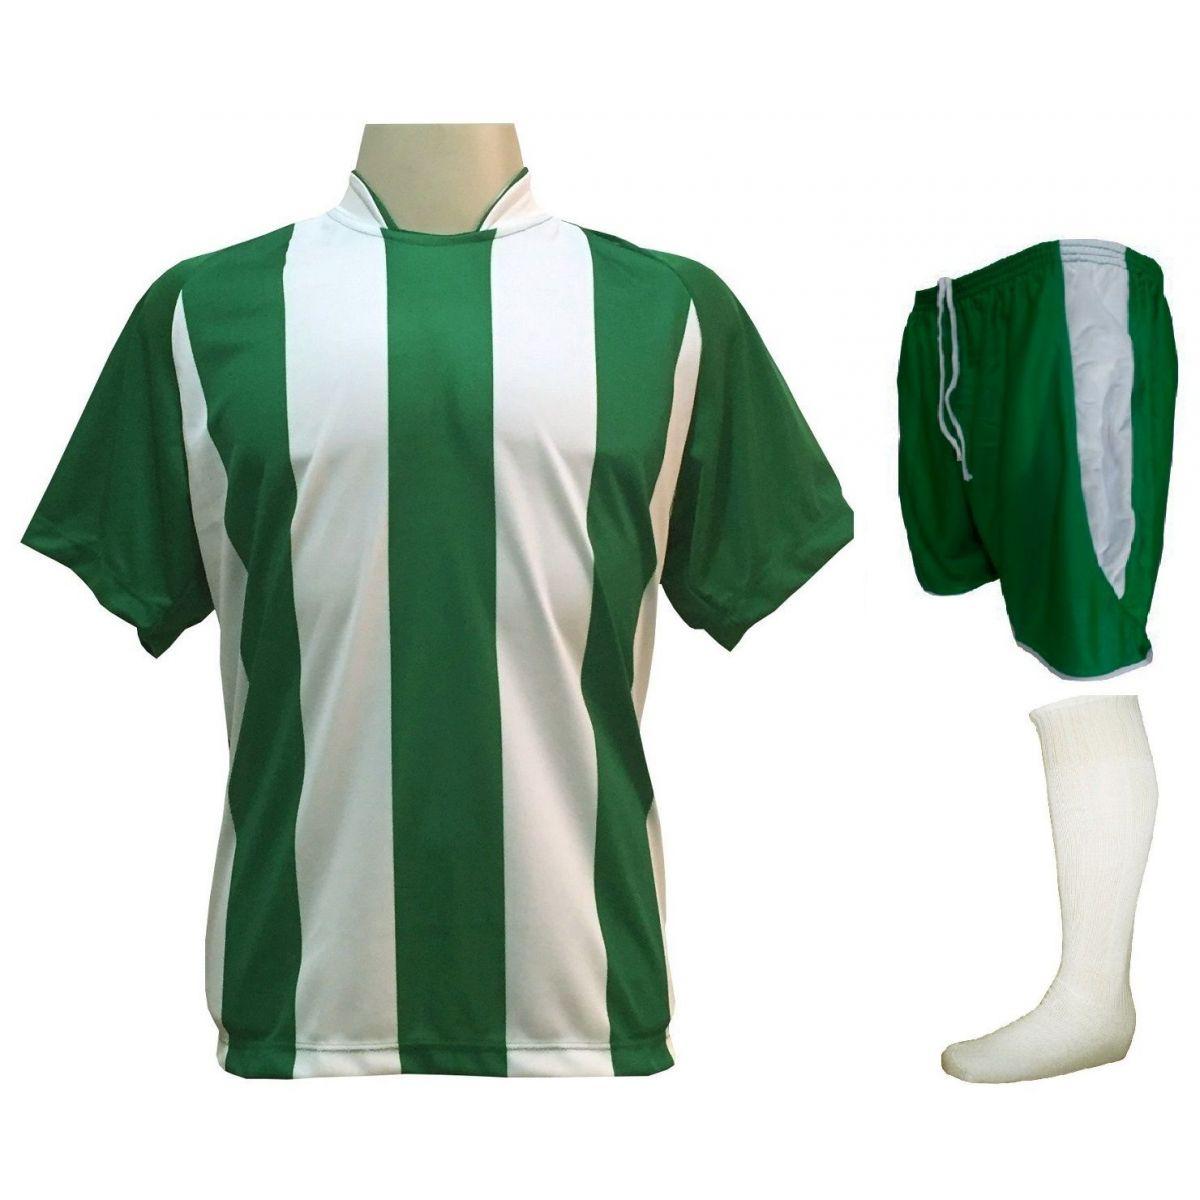 Fardamento Completo modelo Milan 20+1 (20 camisas Verde/Branco + 20 calções modelo Copa Verde/Branco + 20 pares de meiões Branco + 1 conjunto de goleiro) + Brindes